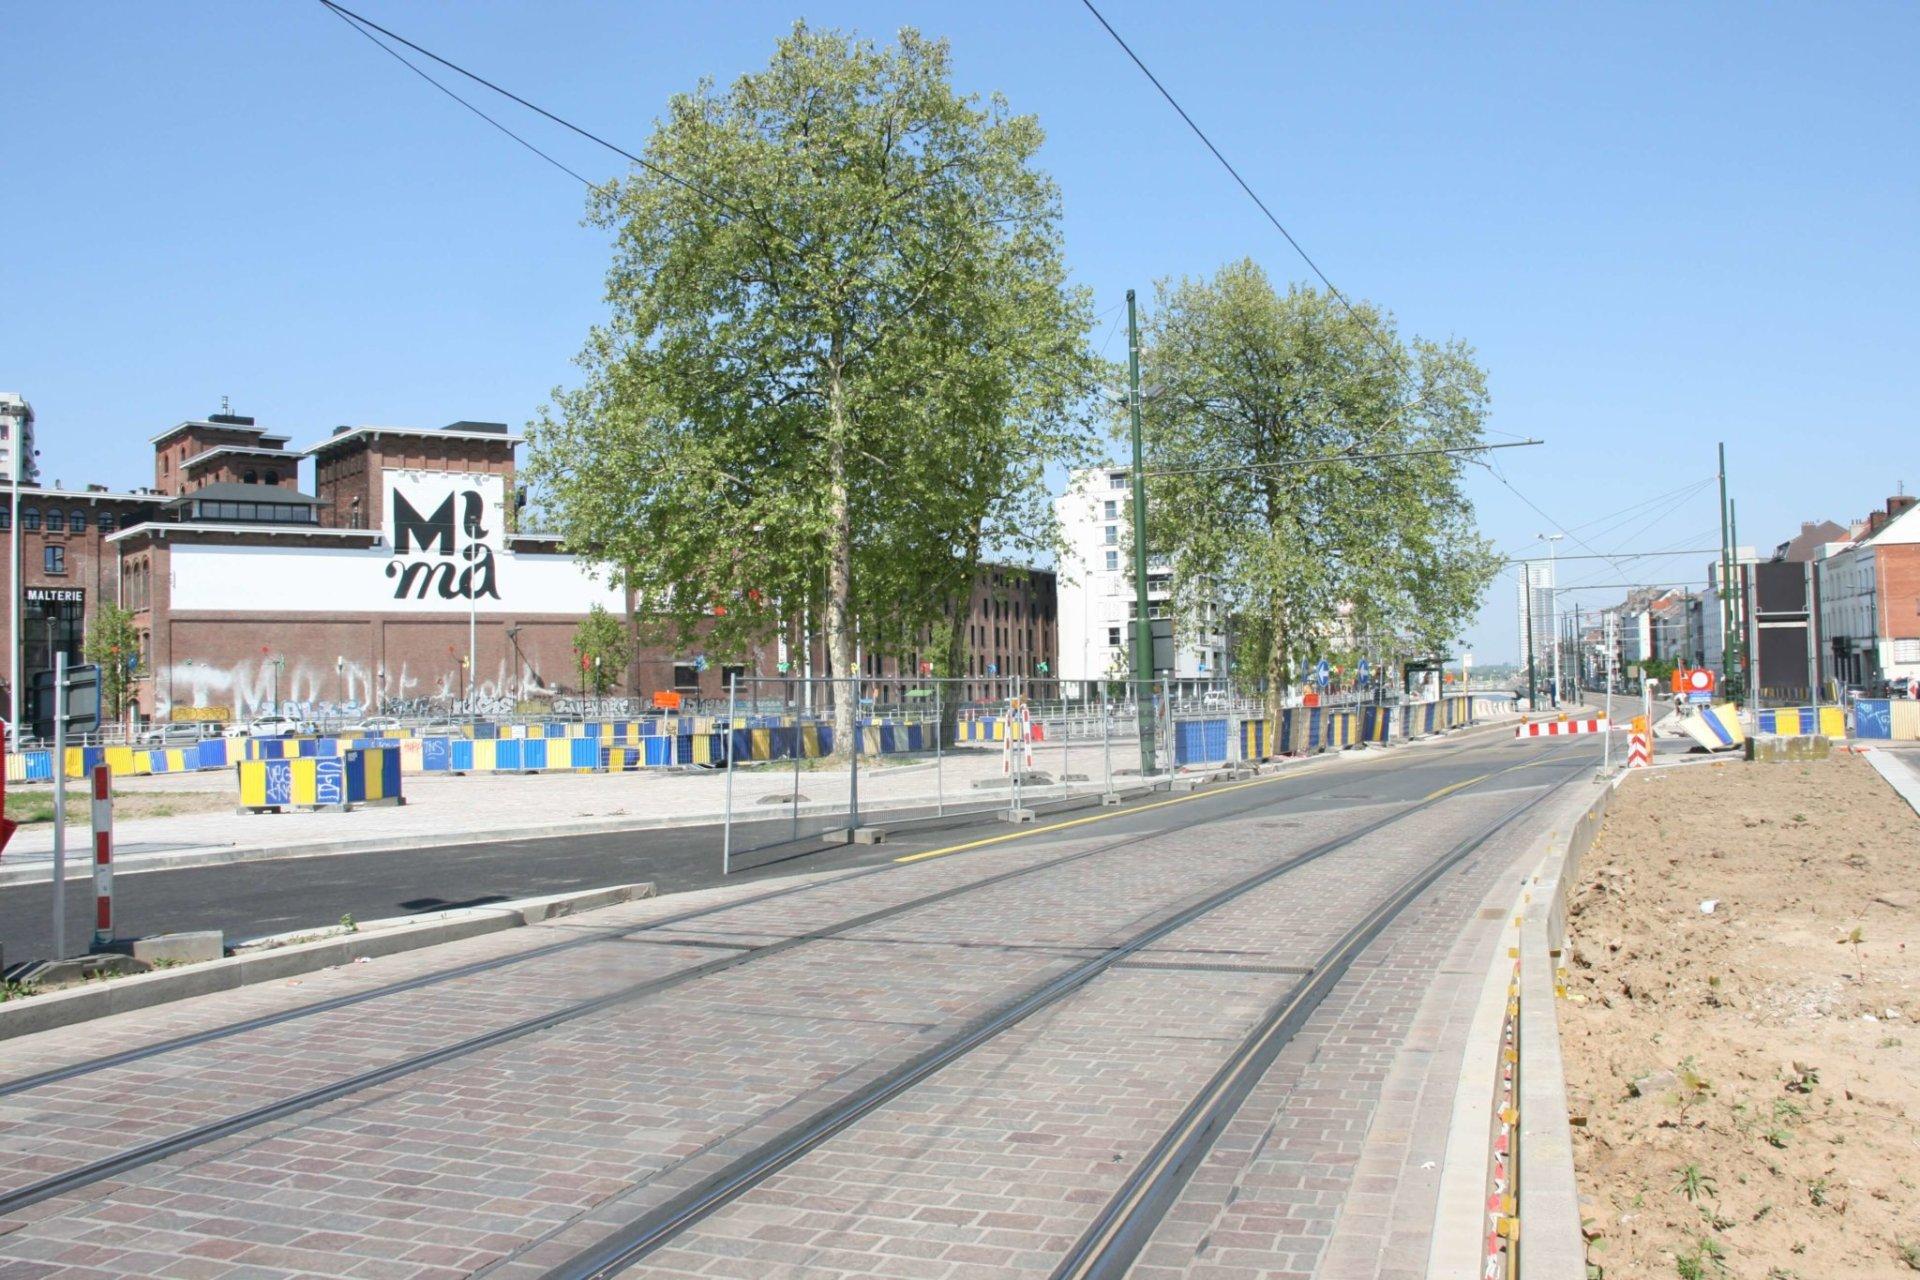 Porte de Ninove Ninoofsepoort 33